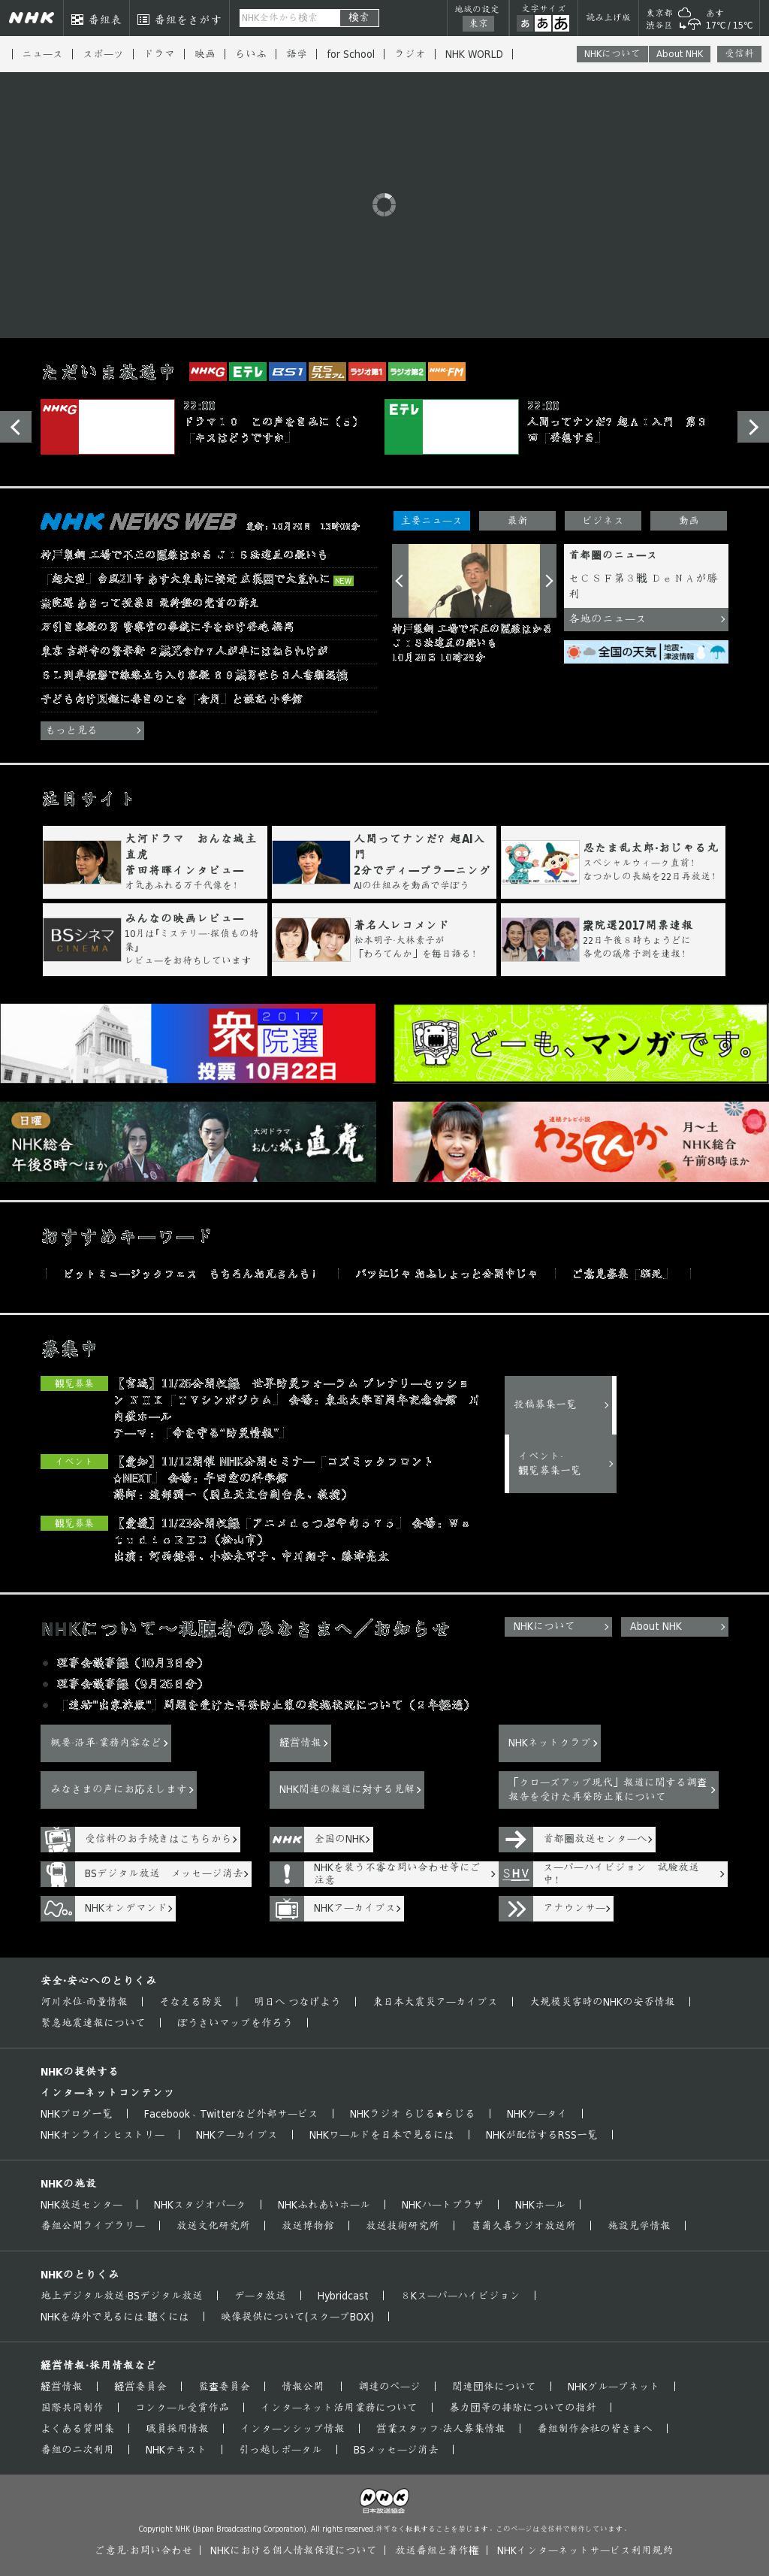 NHK Online at Friday Oct. 20, 2017, 1:10 p.m. UTC